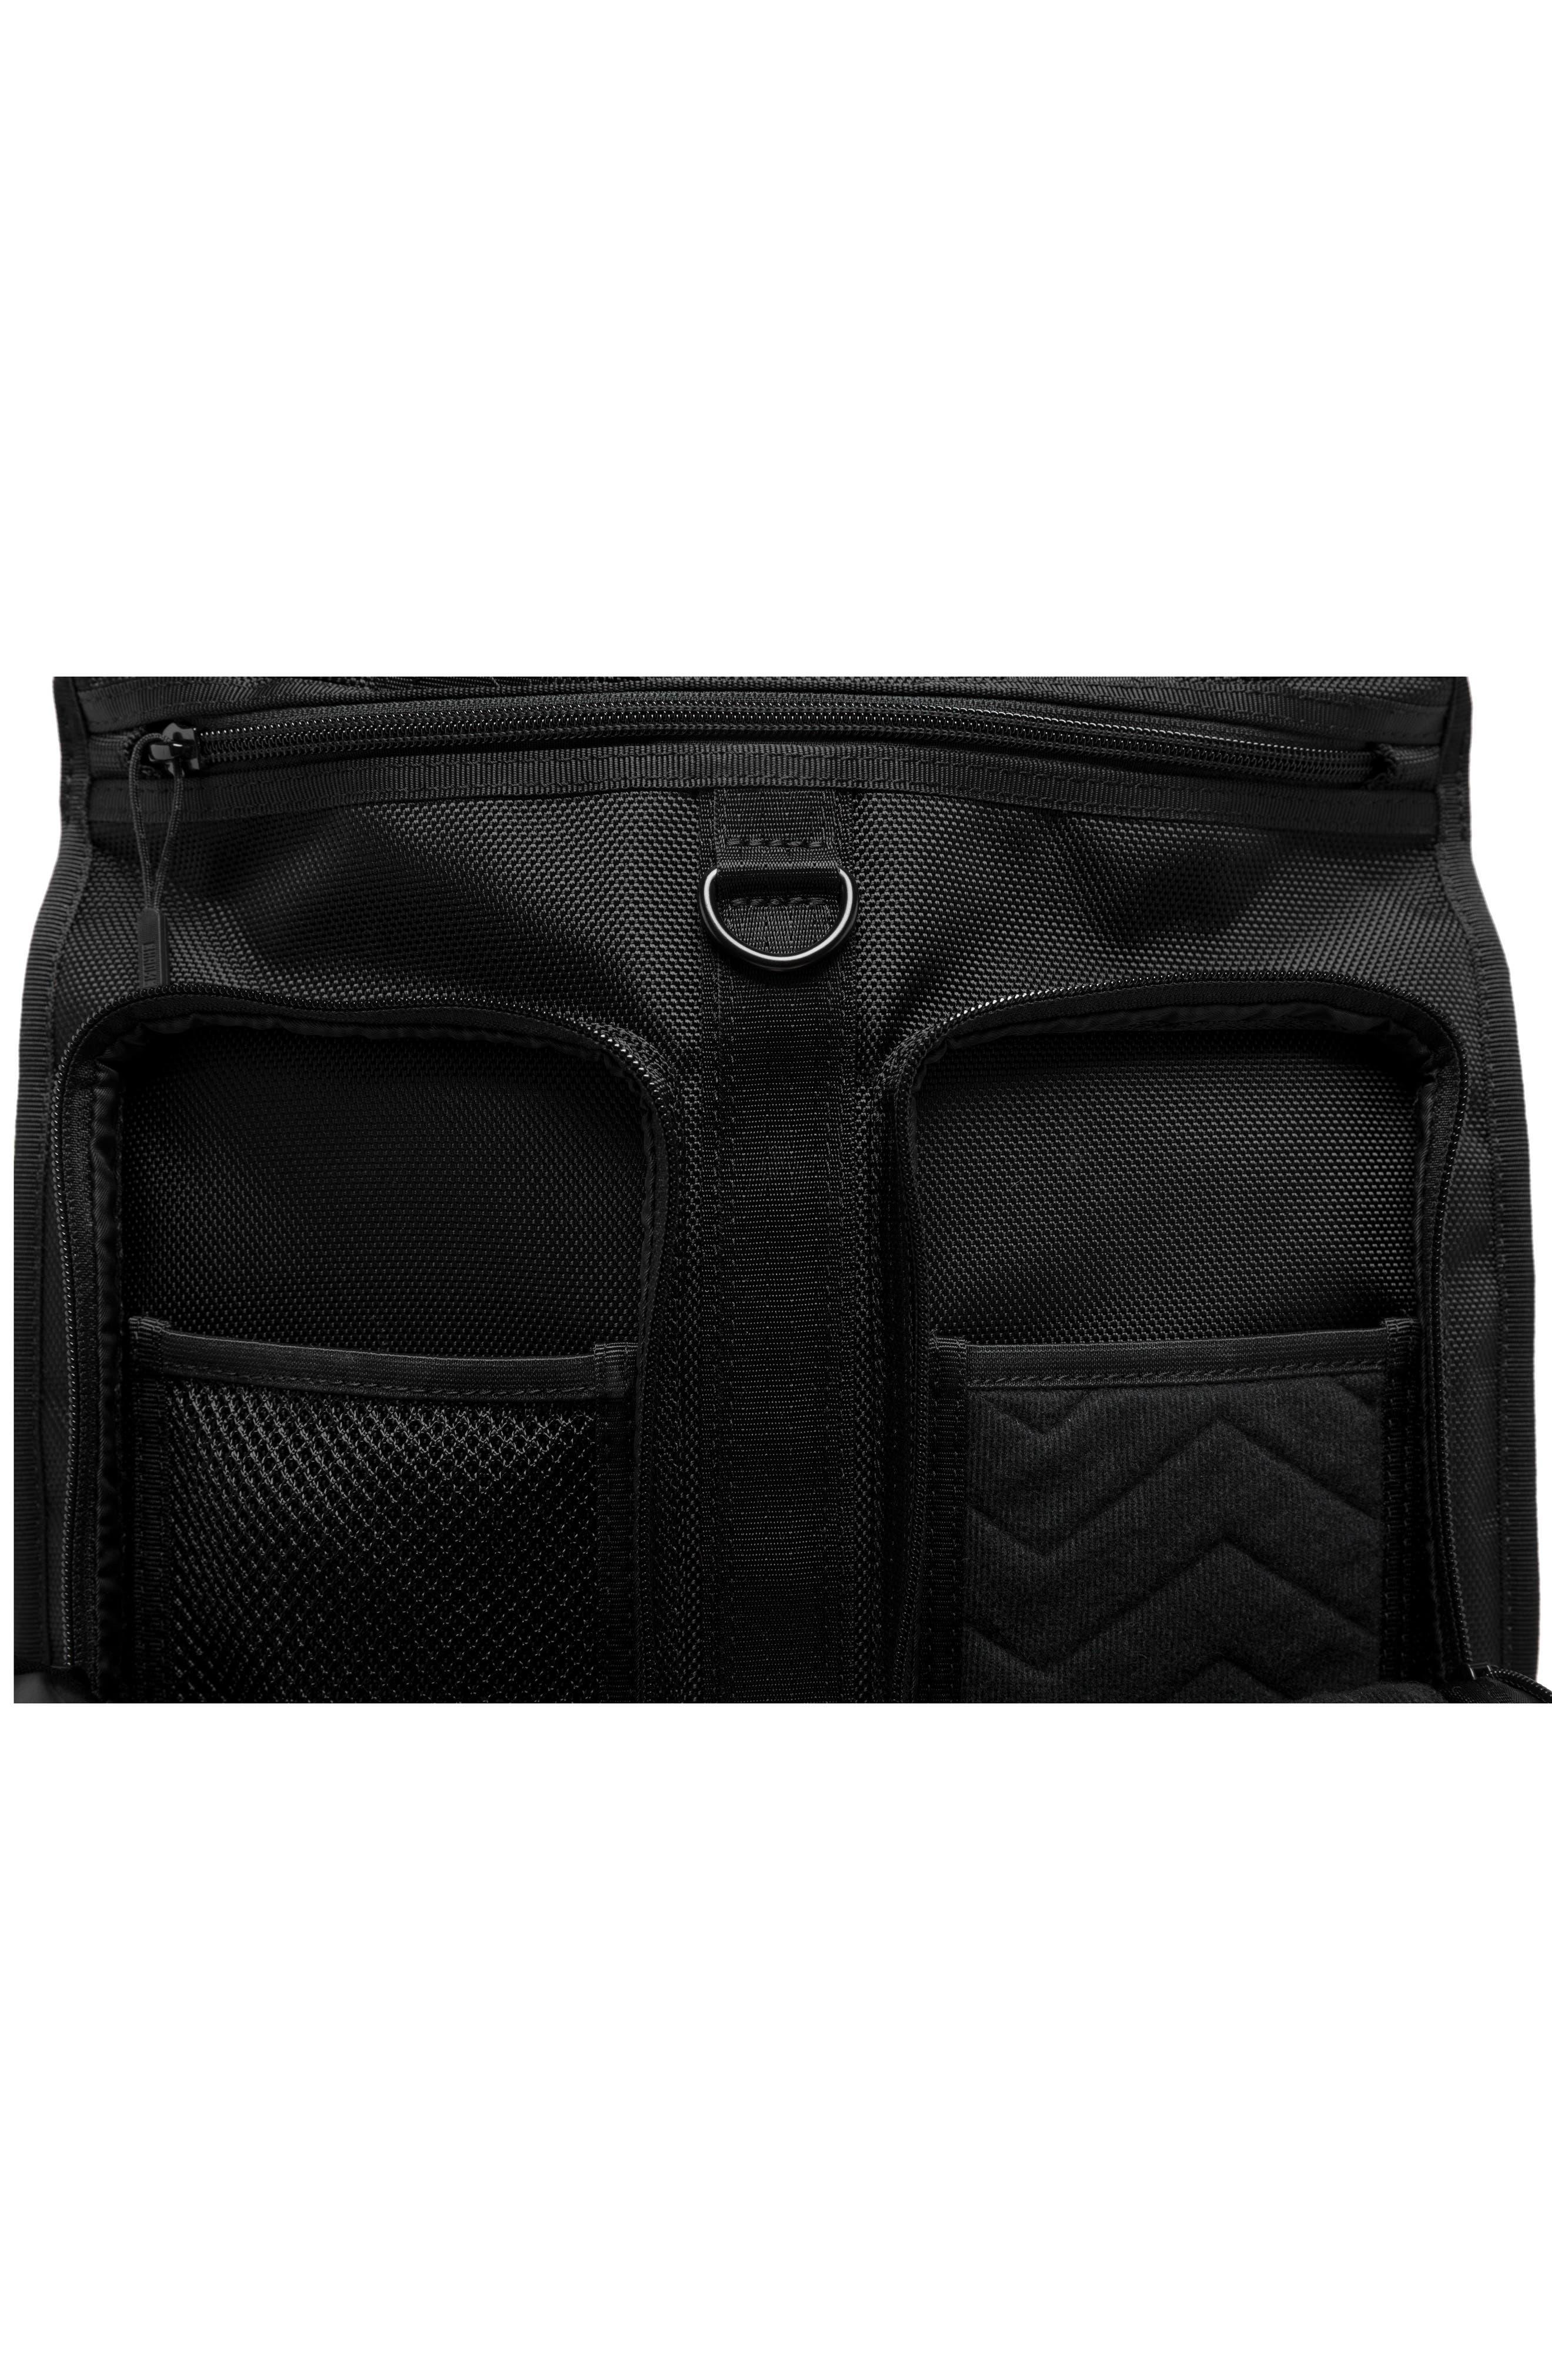 MXD Pace Tote Bag,                             Alternate thumbnail 6, color,                             001